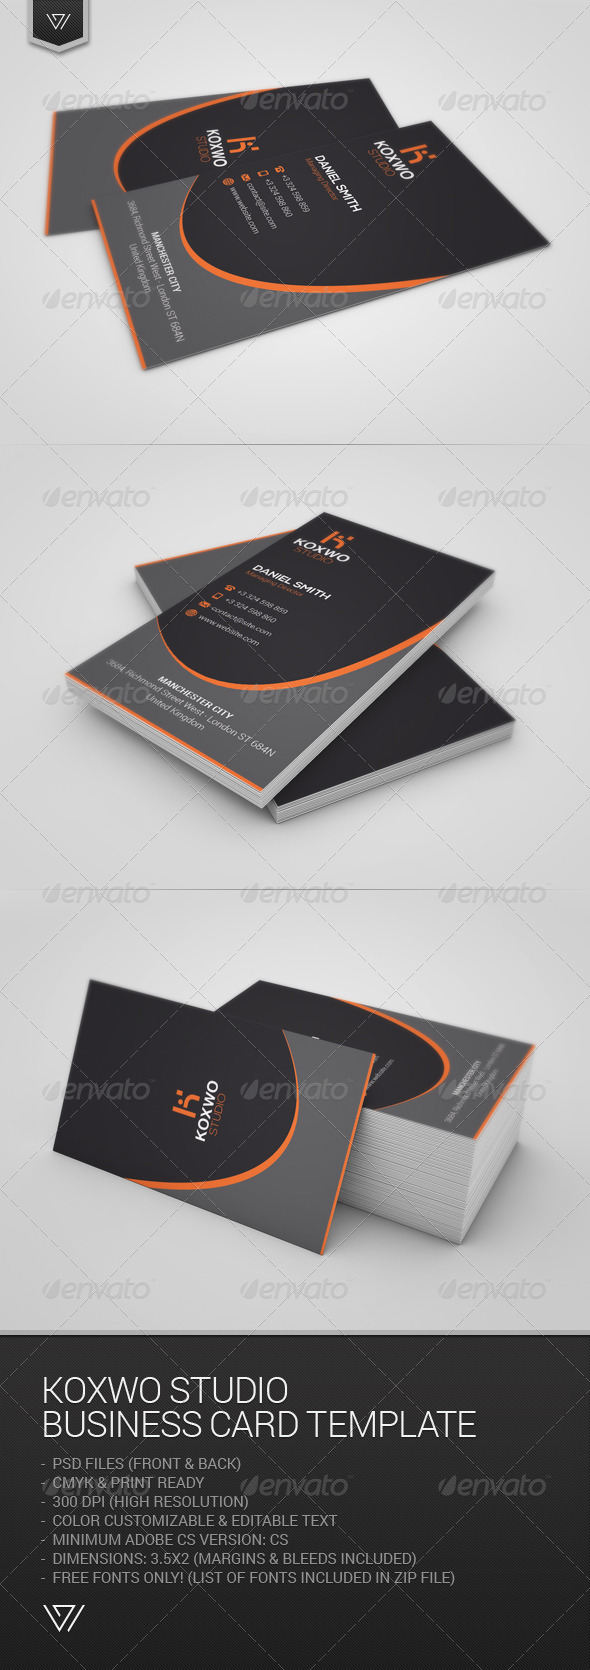 GraphicRiver Koxwo Studio Business Card 7670839